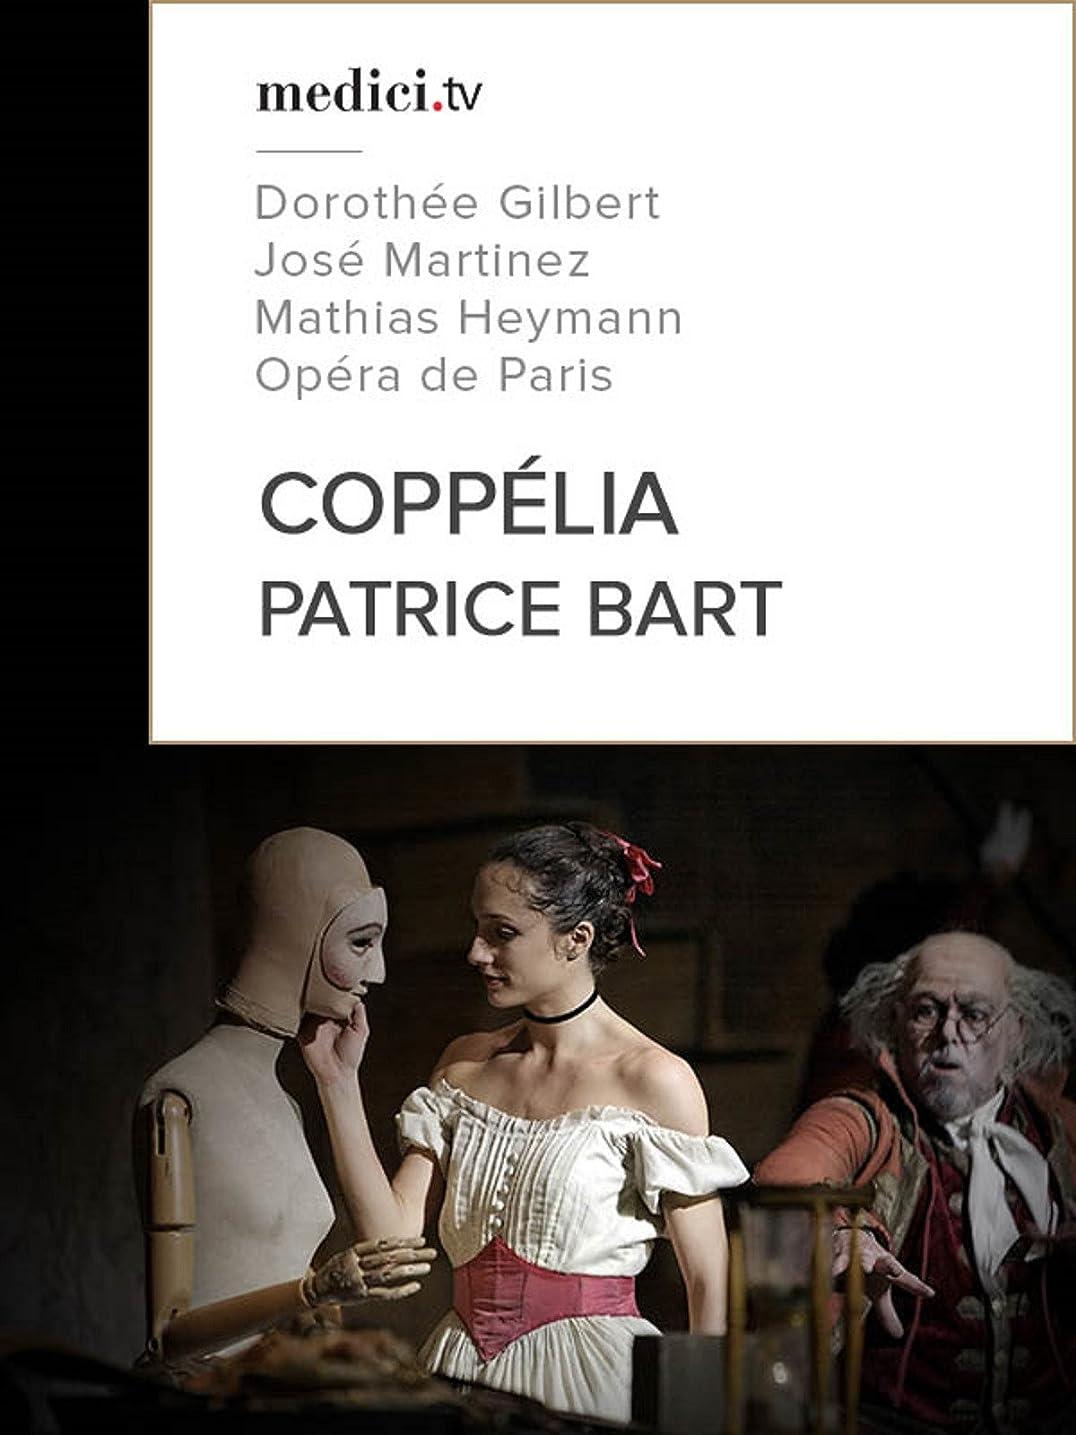 普通に確認してください異邦人Patrice Bart, Coppélia - Dorothée Gilbert, José Martinez, Mathias Heymann - Opéra de Paris